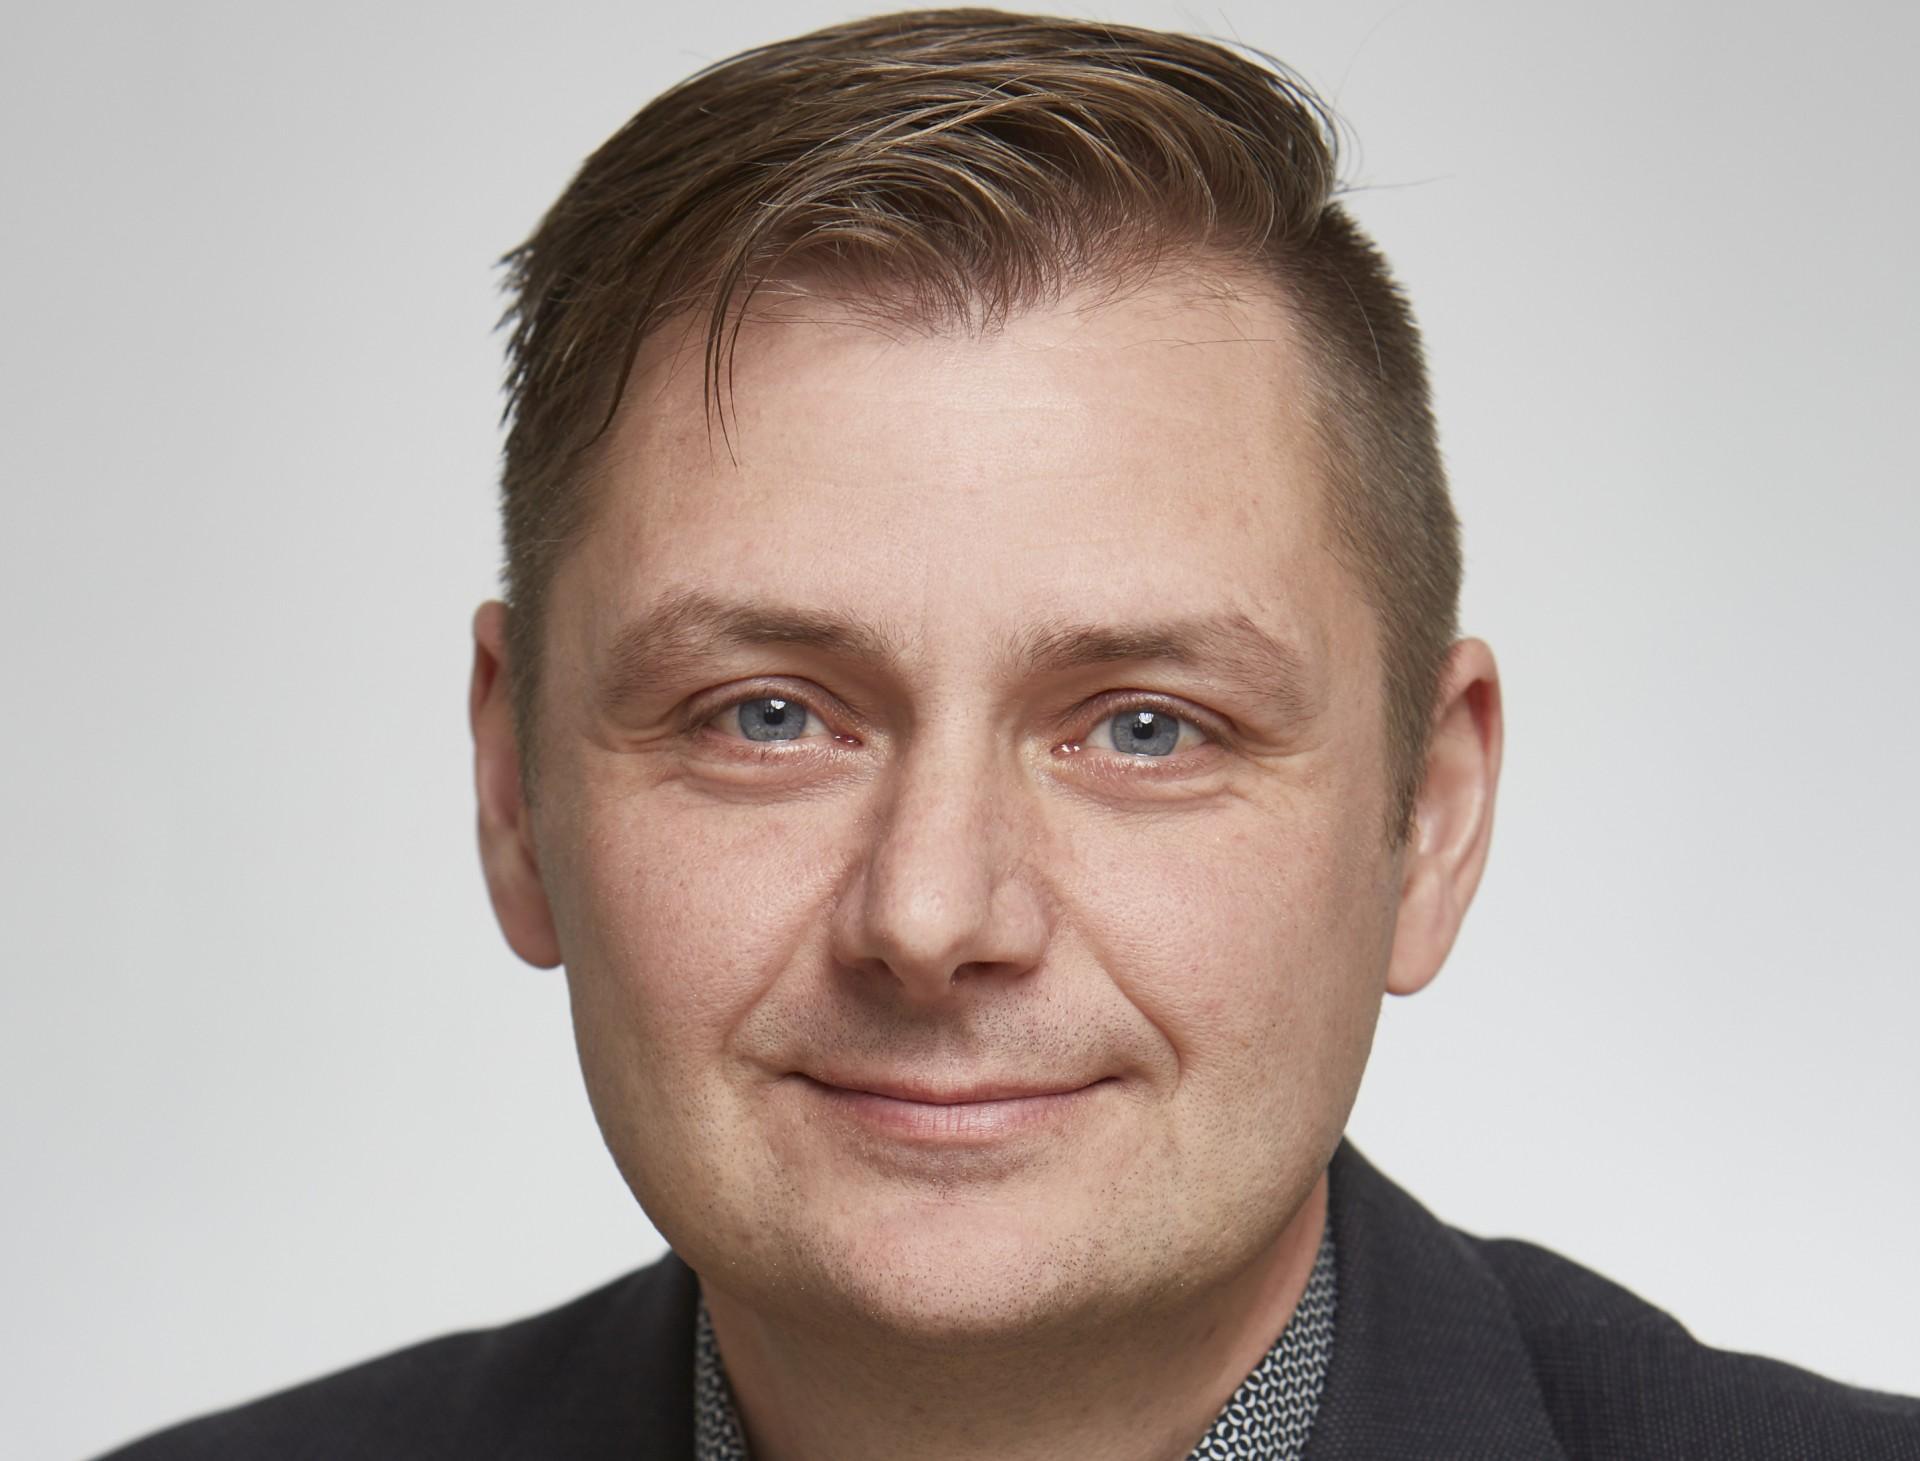 dansk amatør sex rør escotguide